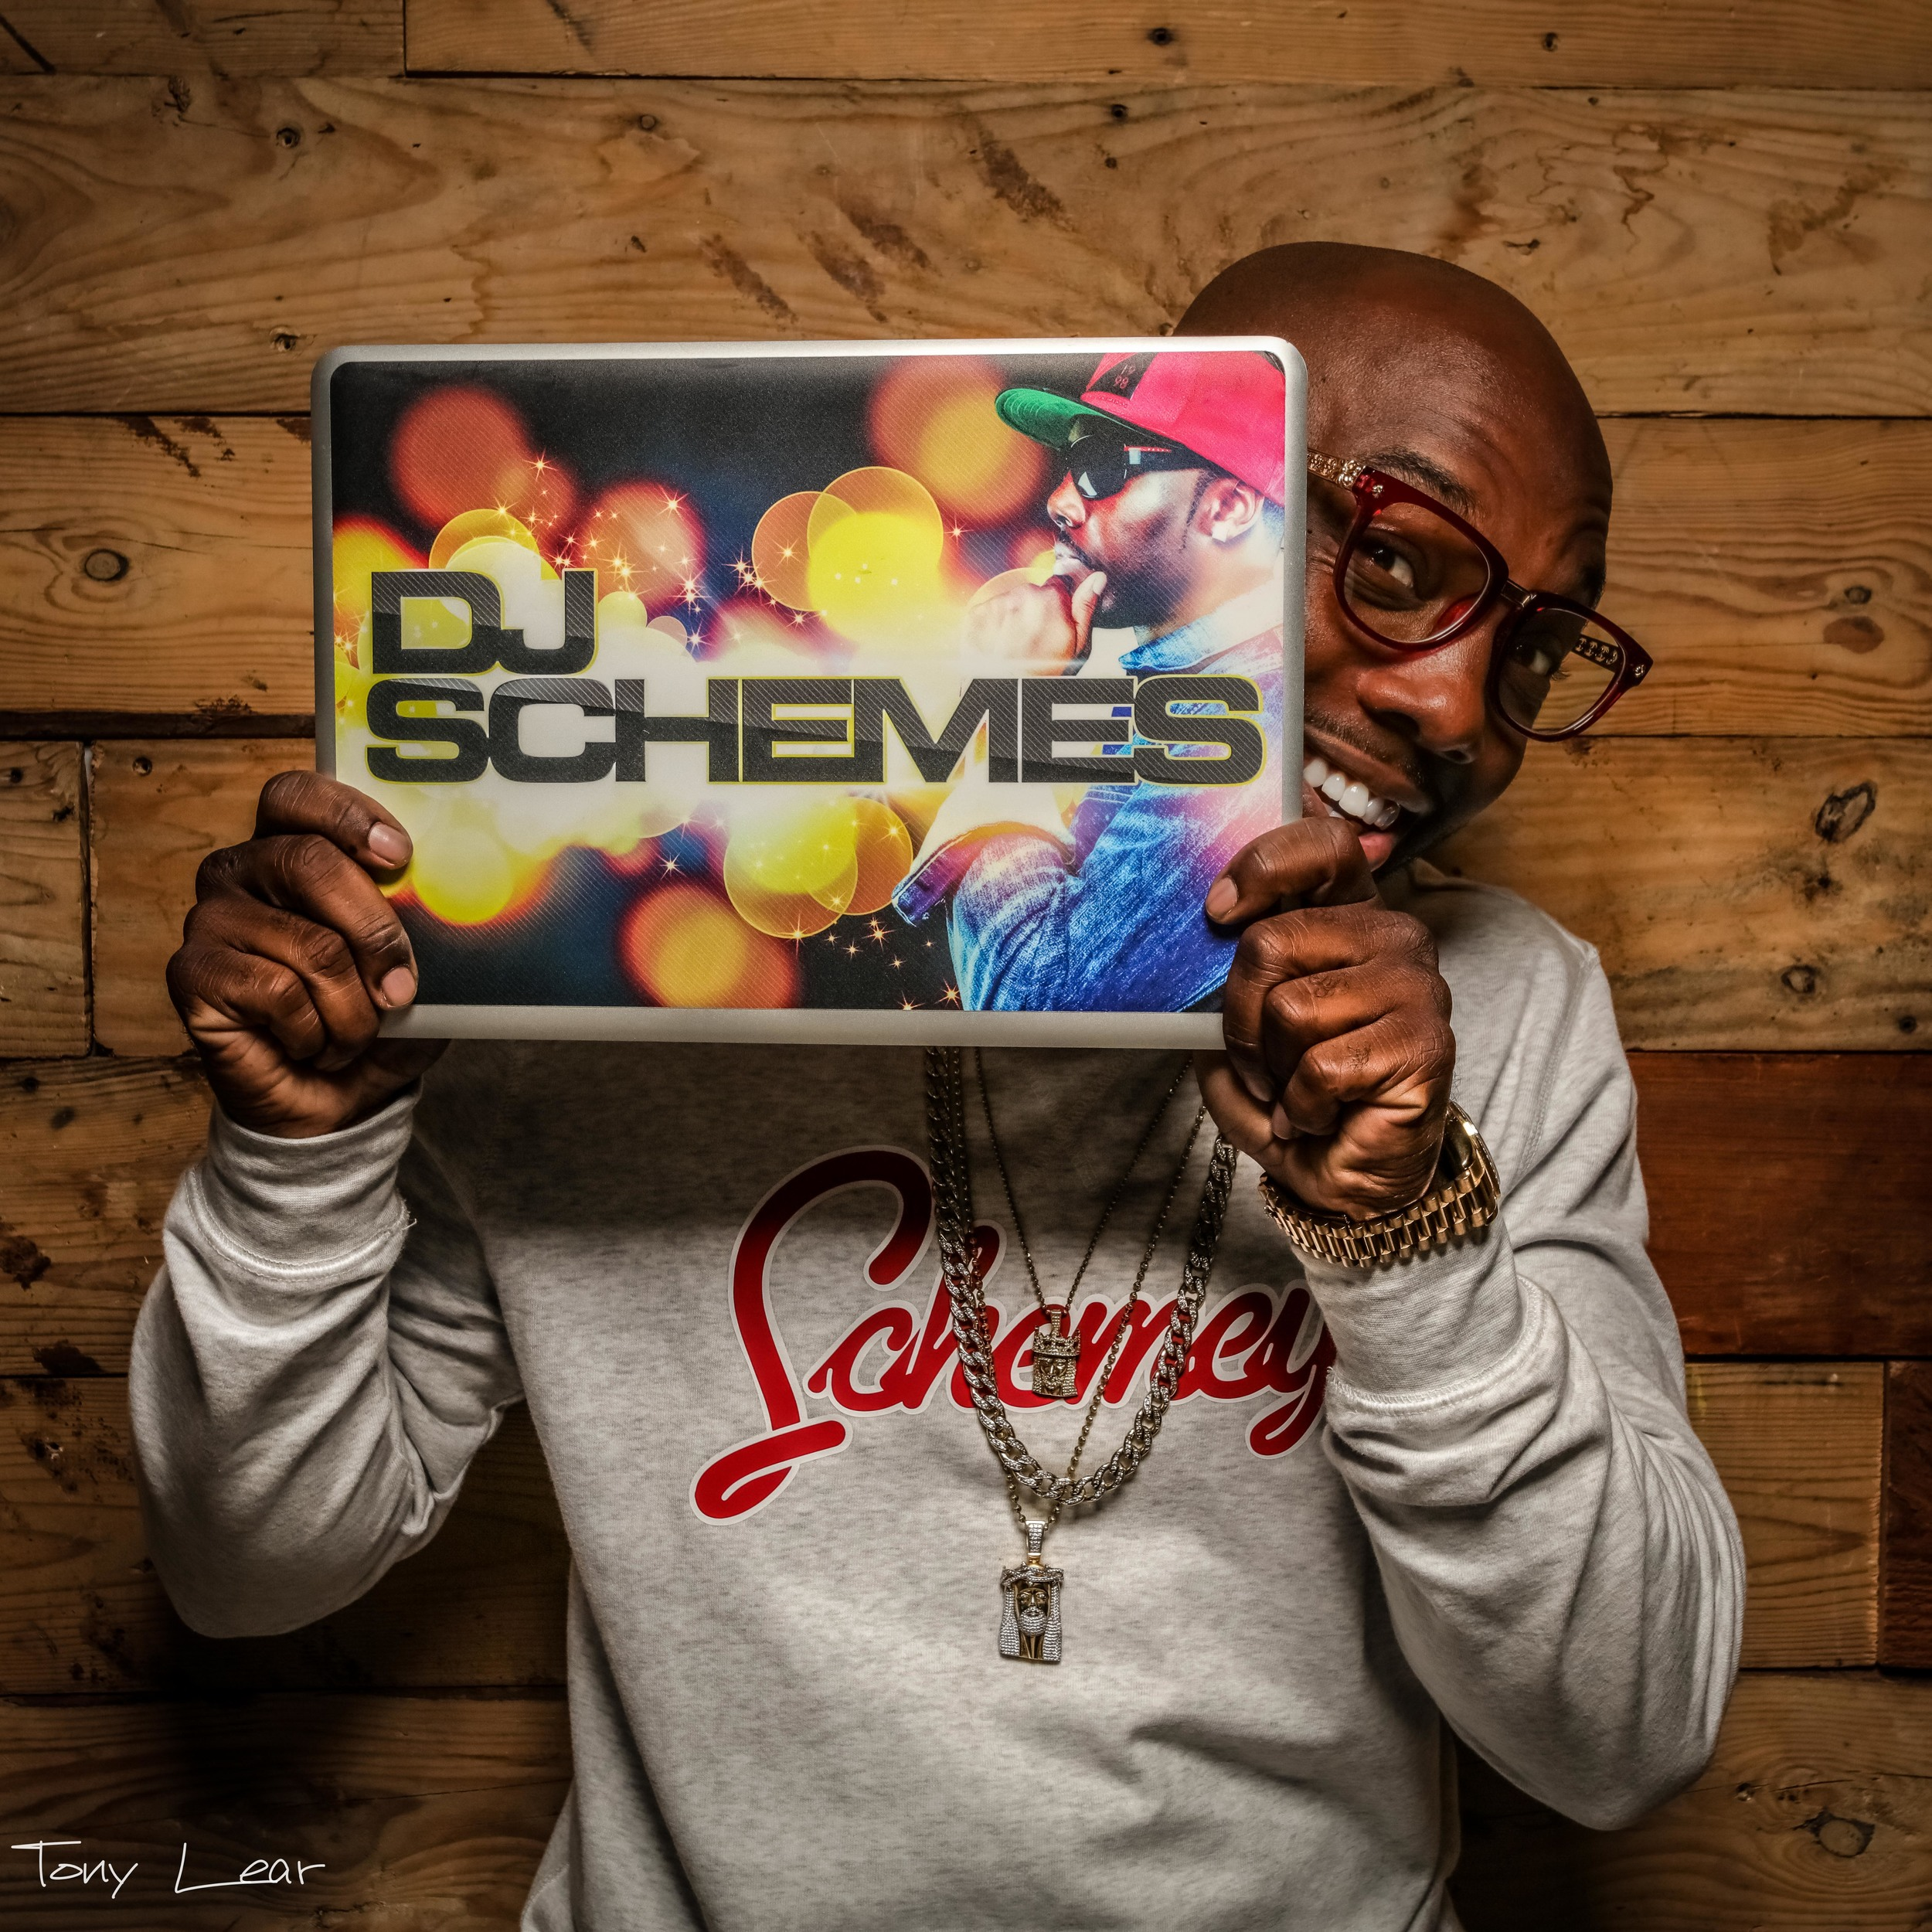 dj schemes-28.jpg